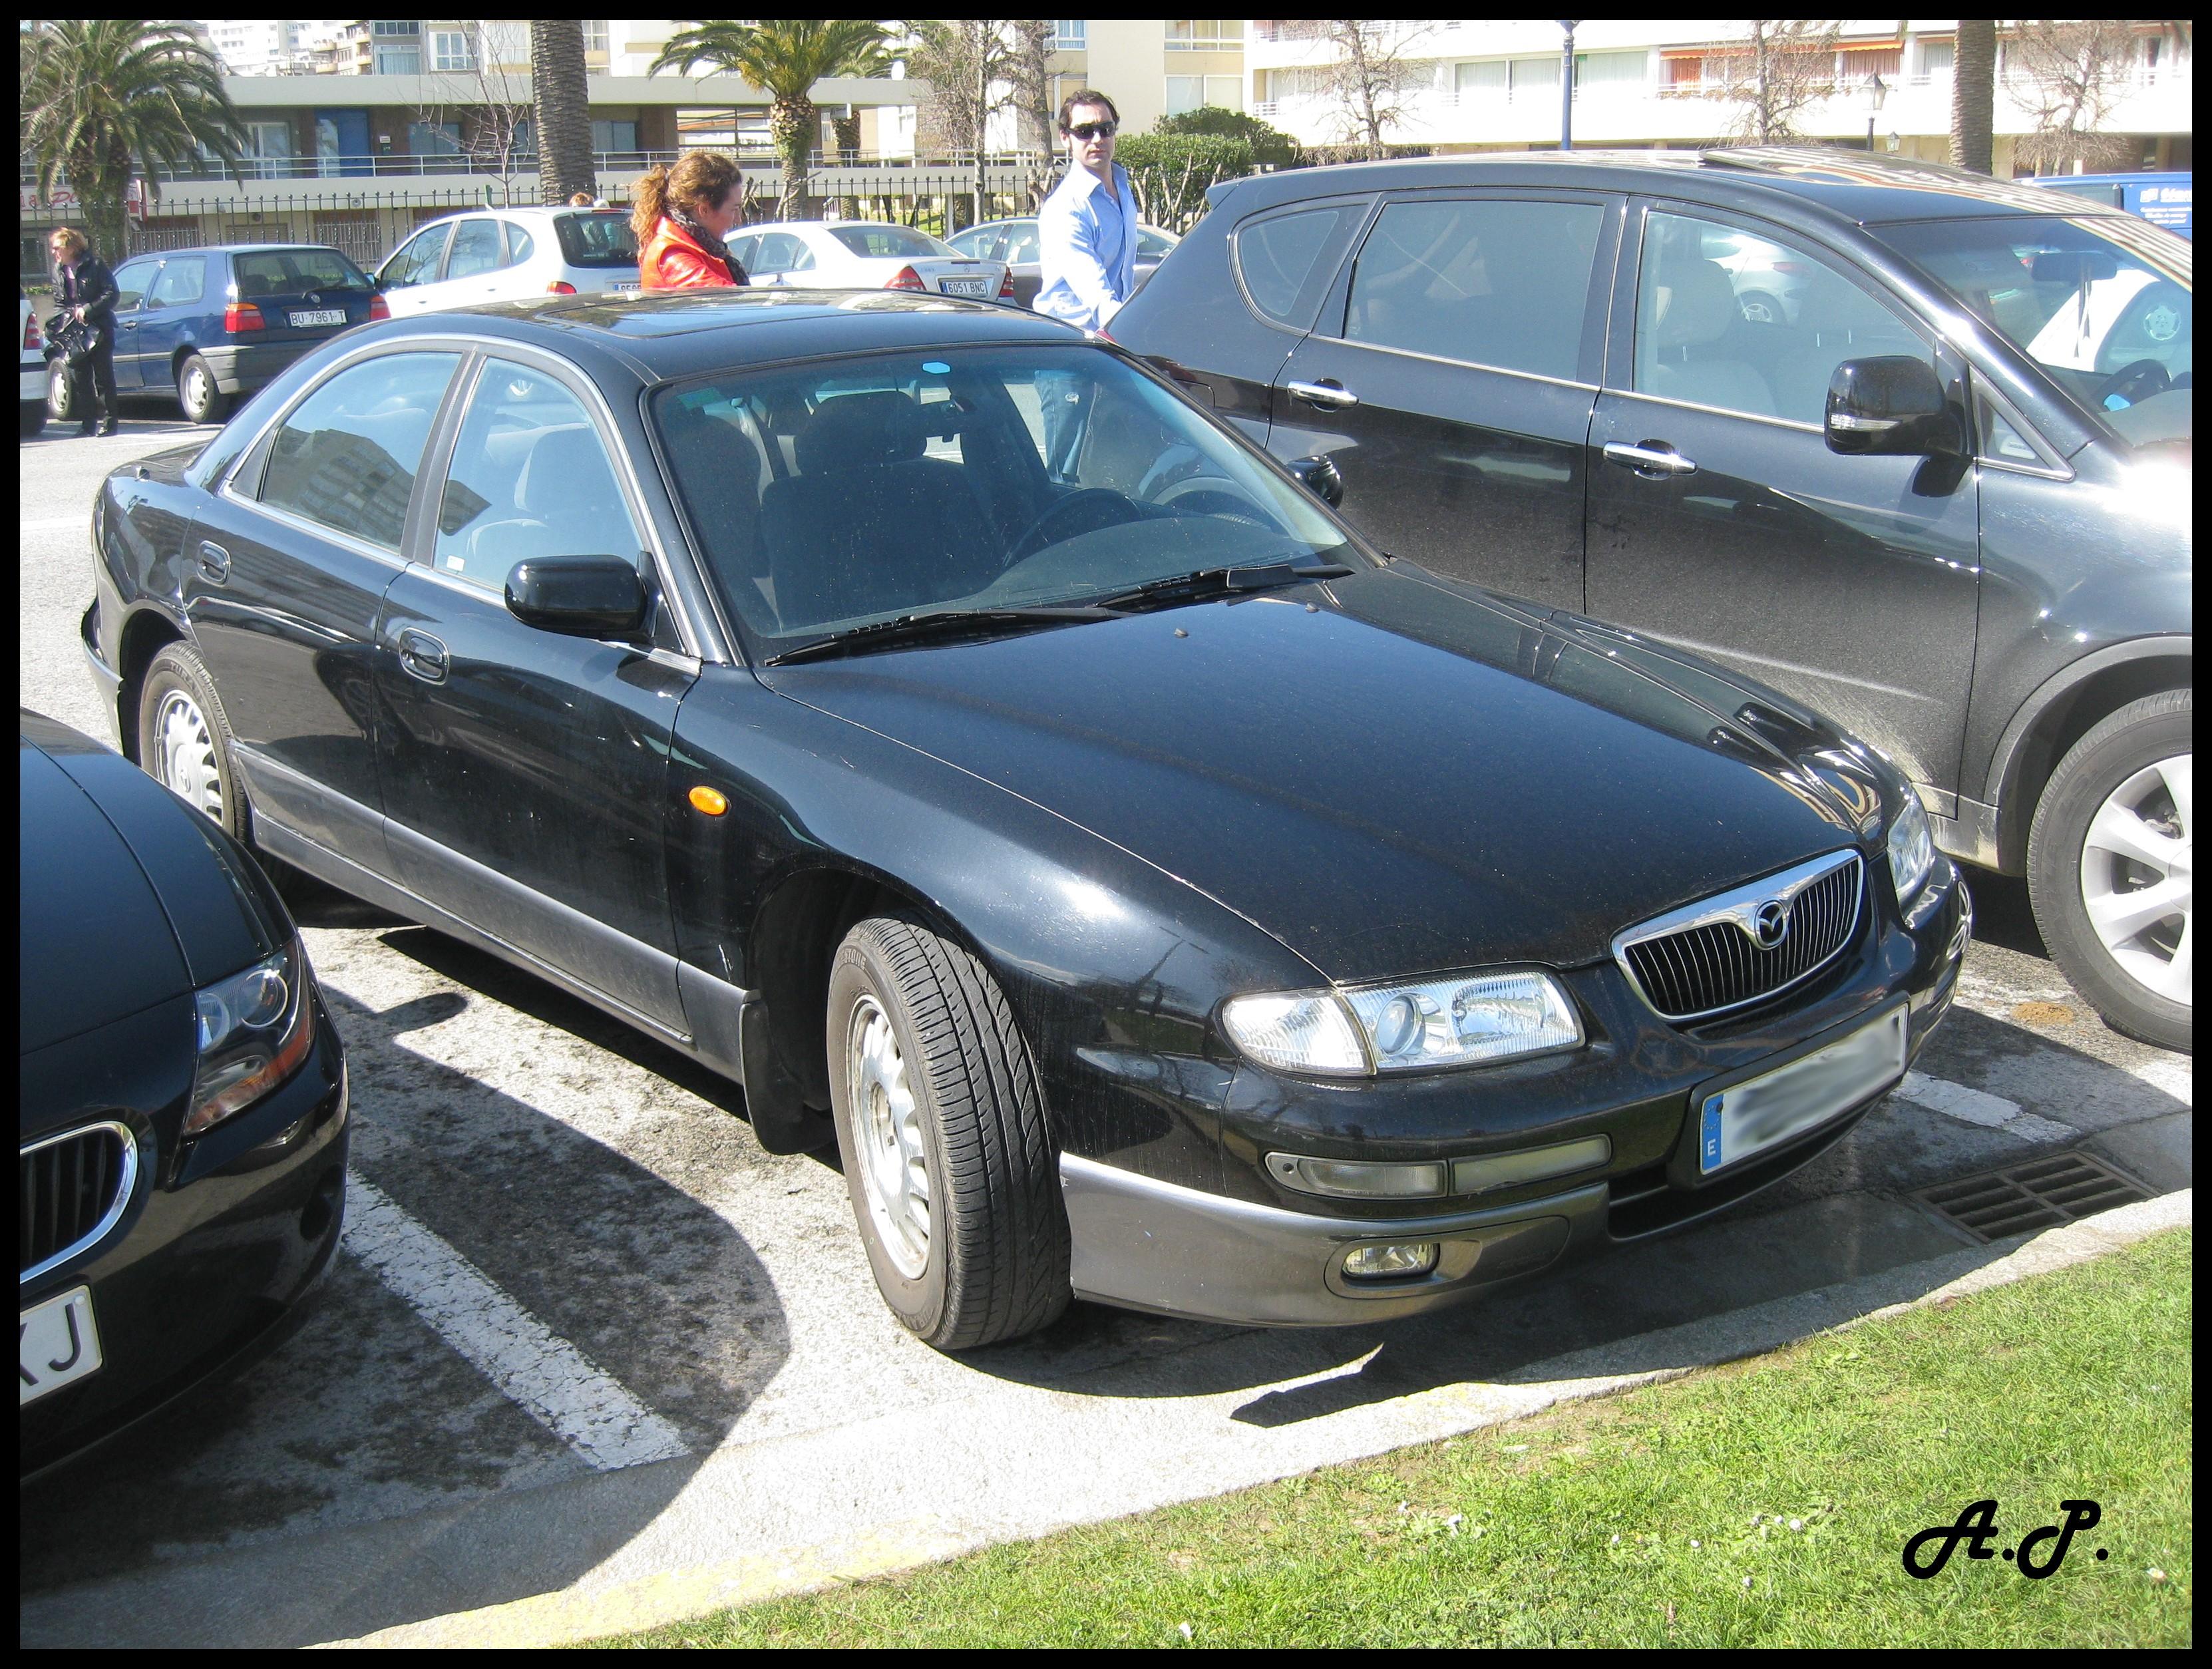 https://upload.wikimedia.org/wikipedia/commons/0/06/2000_Mazda_Xedos_9_%283685989066%29.jpg